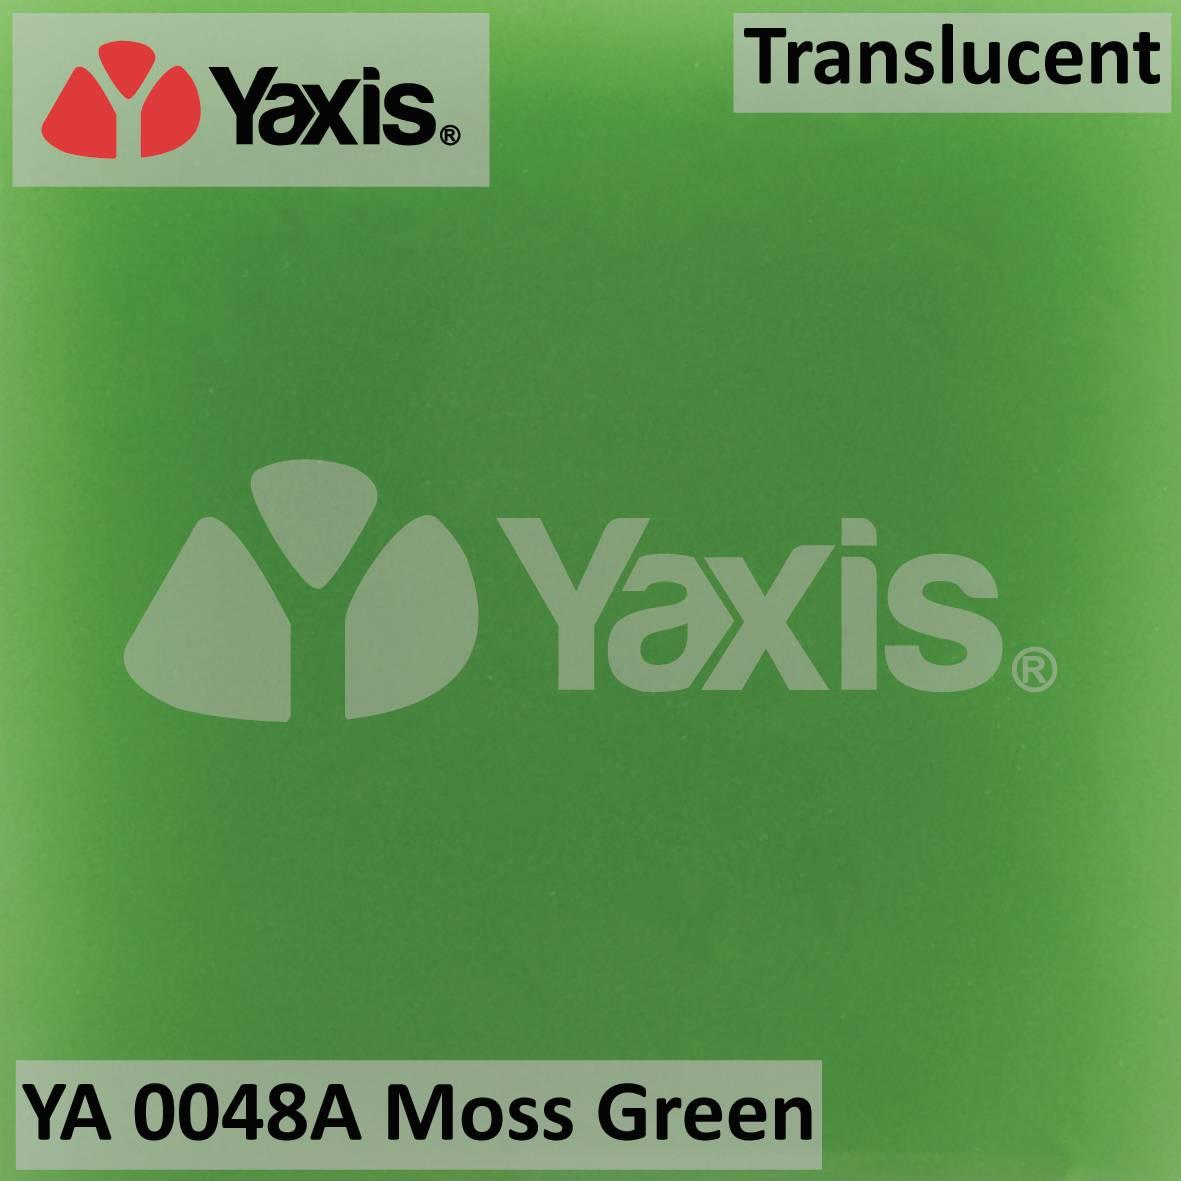 YA 0048A-moss-green-translucent-solid surface-quartz-stone